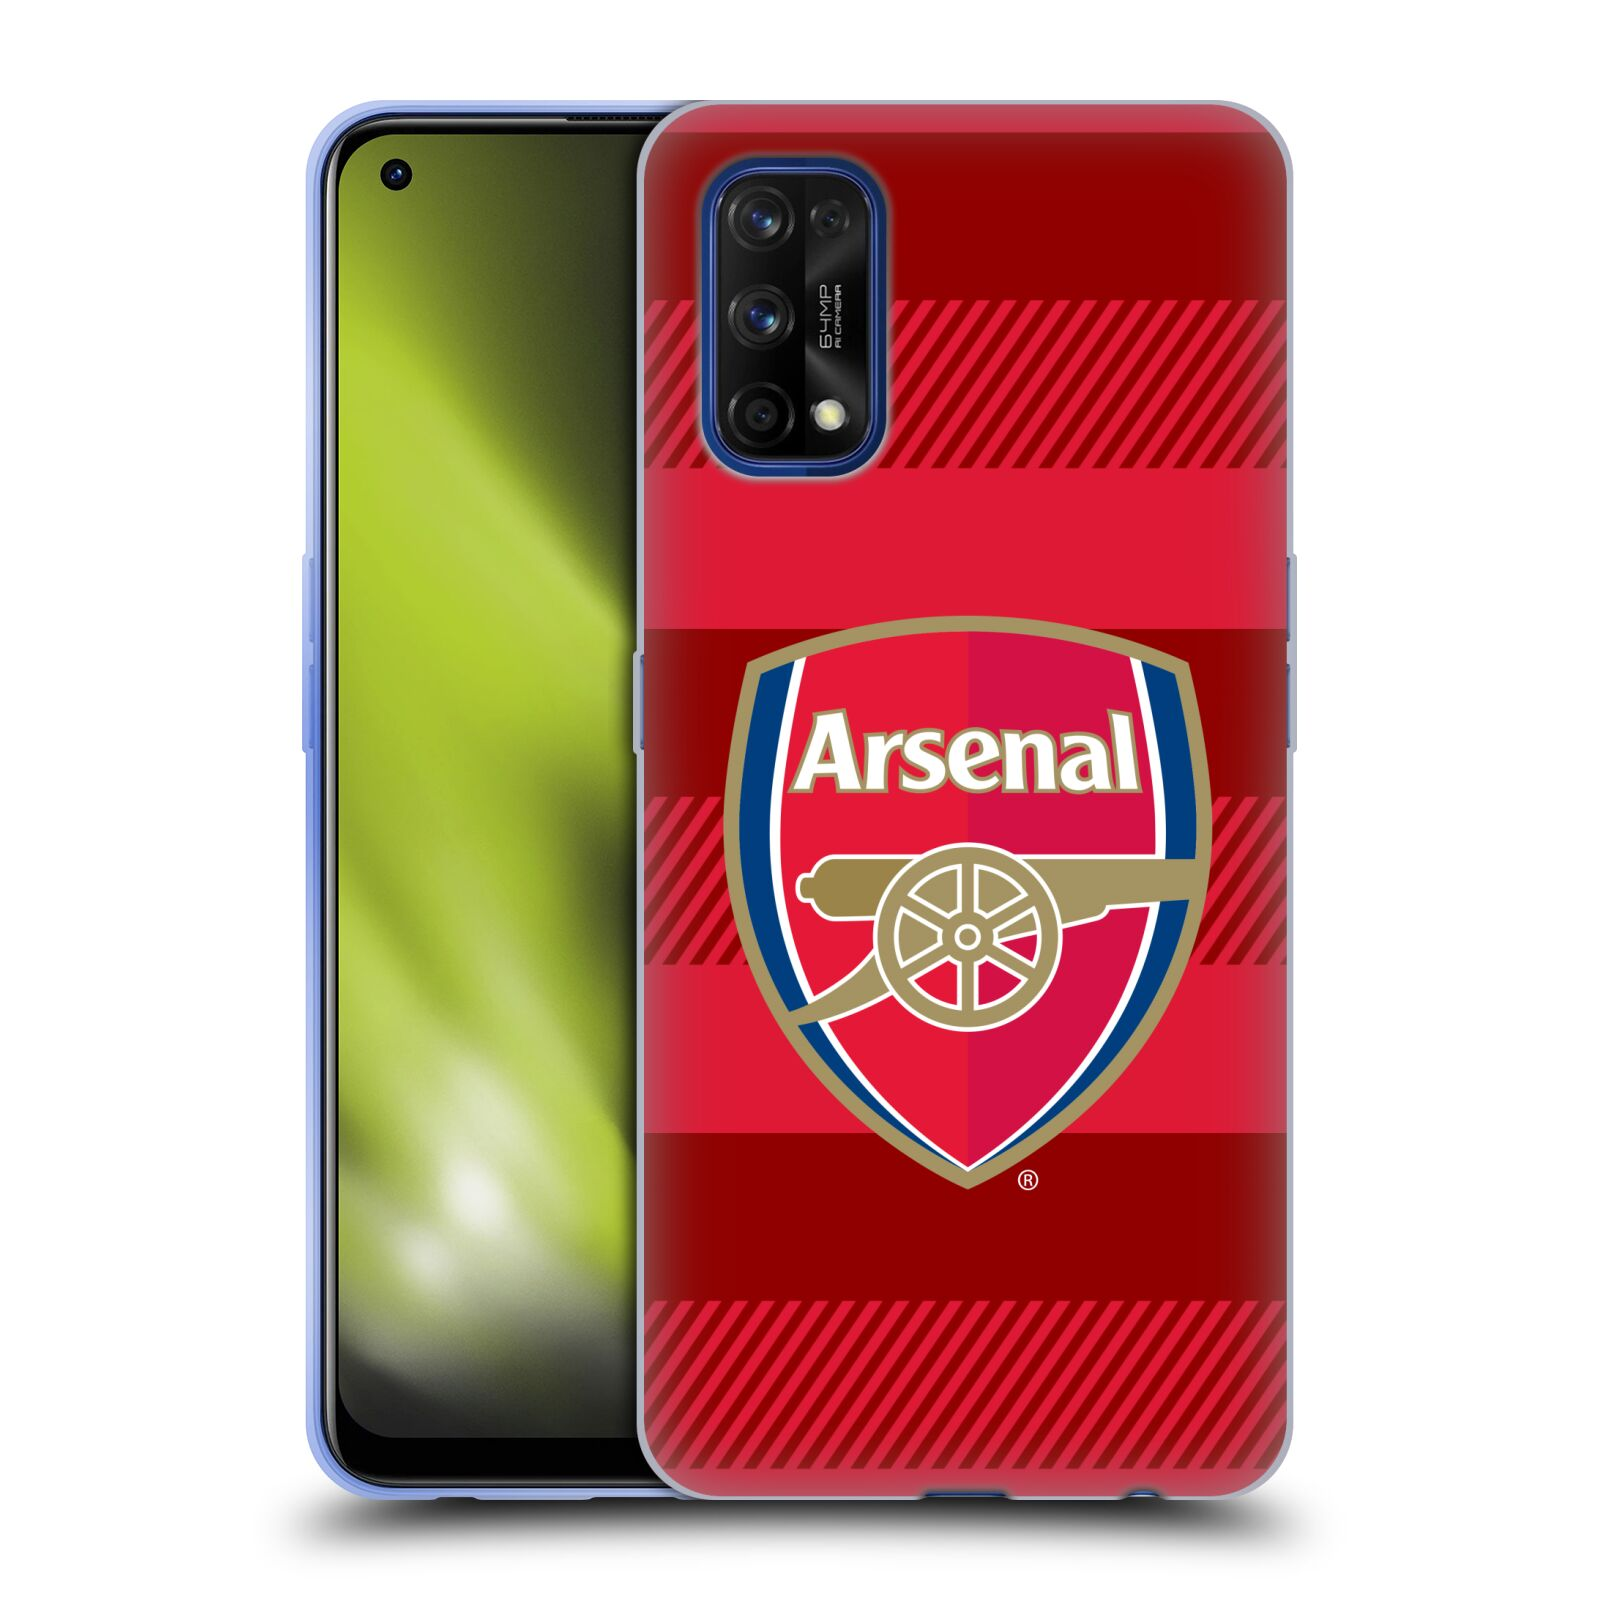 Silikonové pouzdro na mobil Realme 7 Pro - Head Case - Arsenal FC - Logo s pruhy